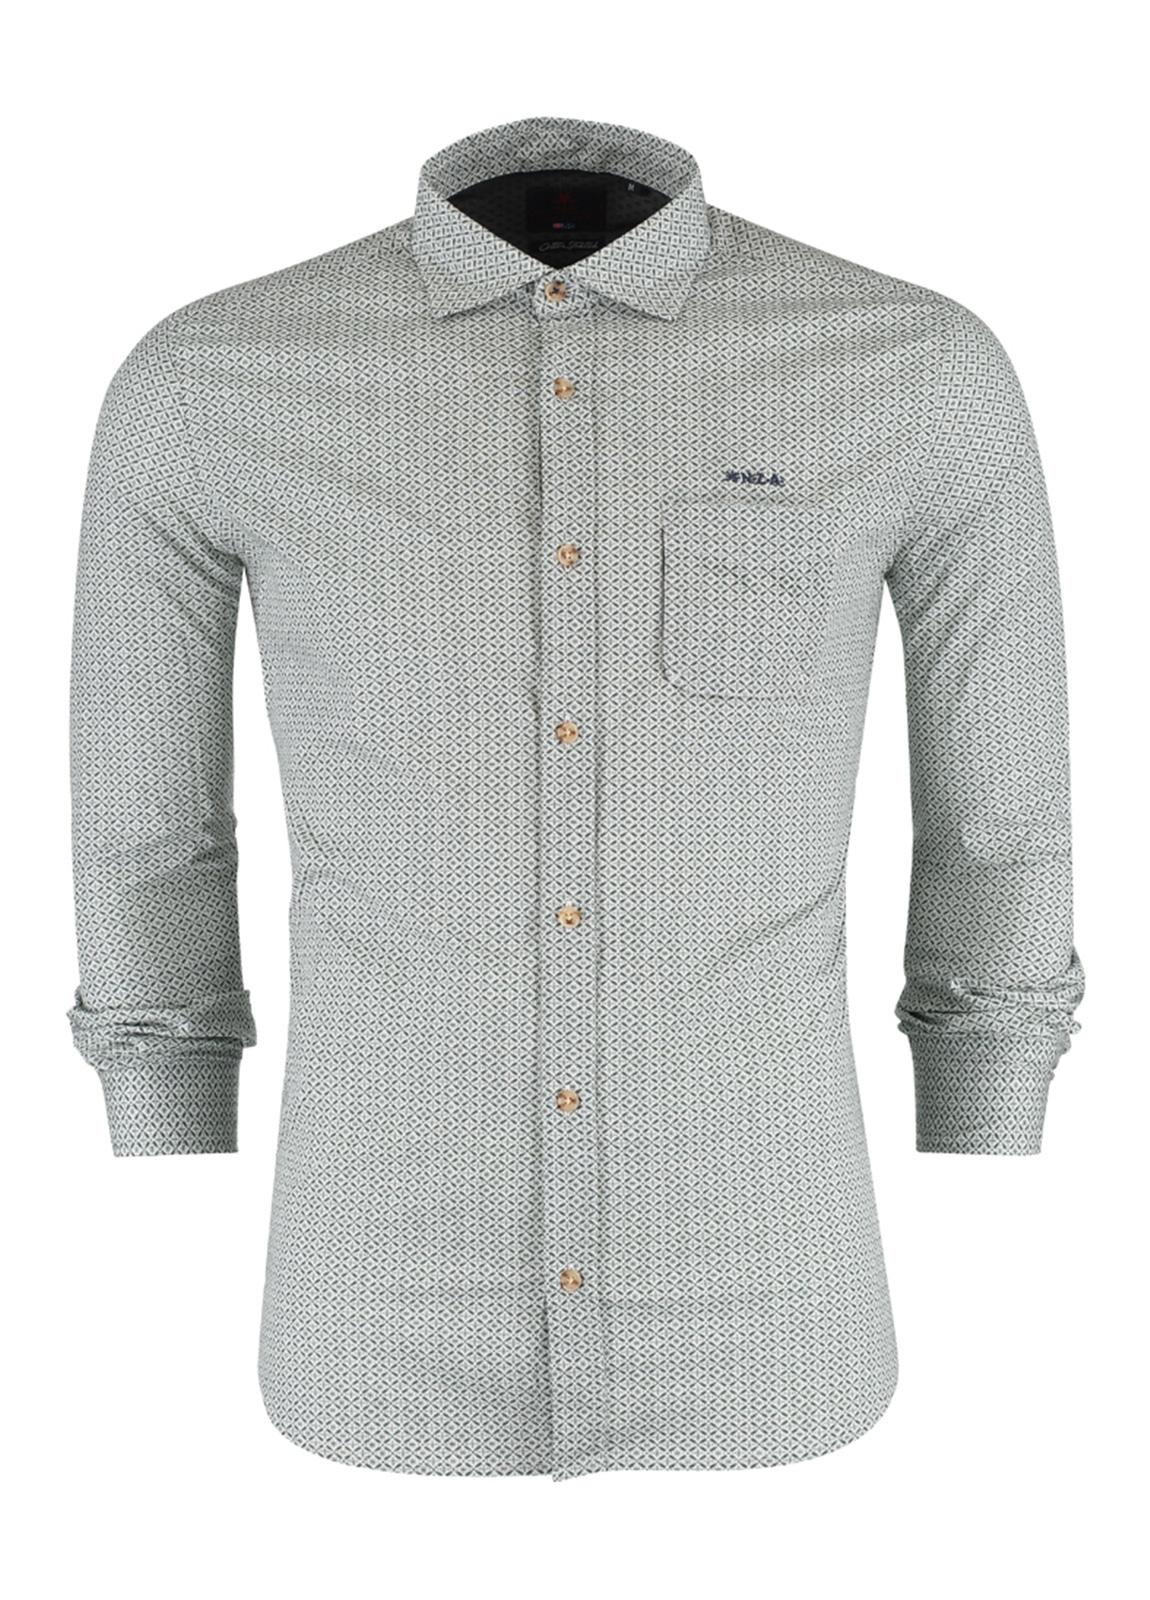 Camisa Sport m/larga, dibujo geométrico color verde, Algodón y elastan.